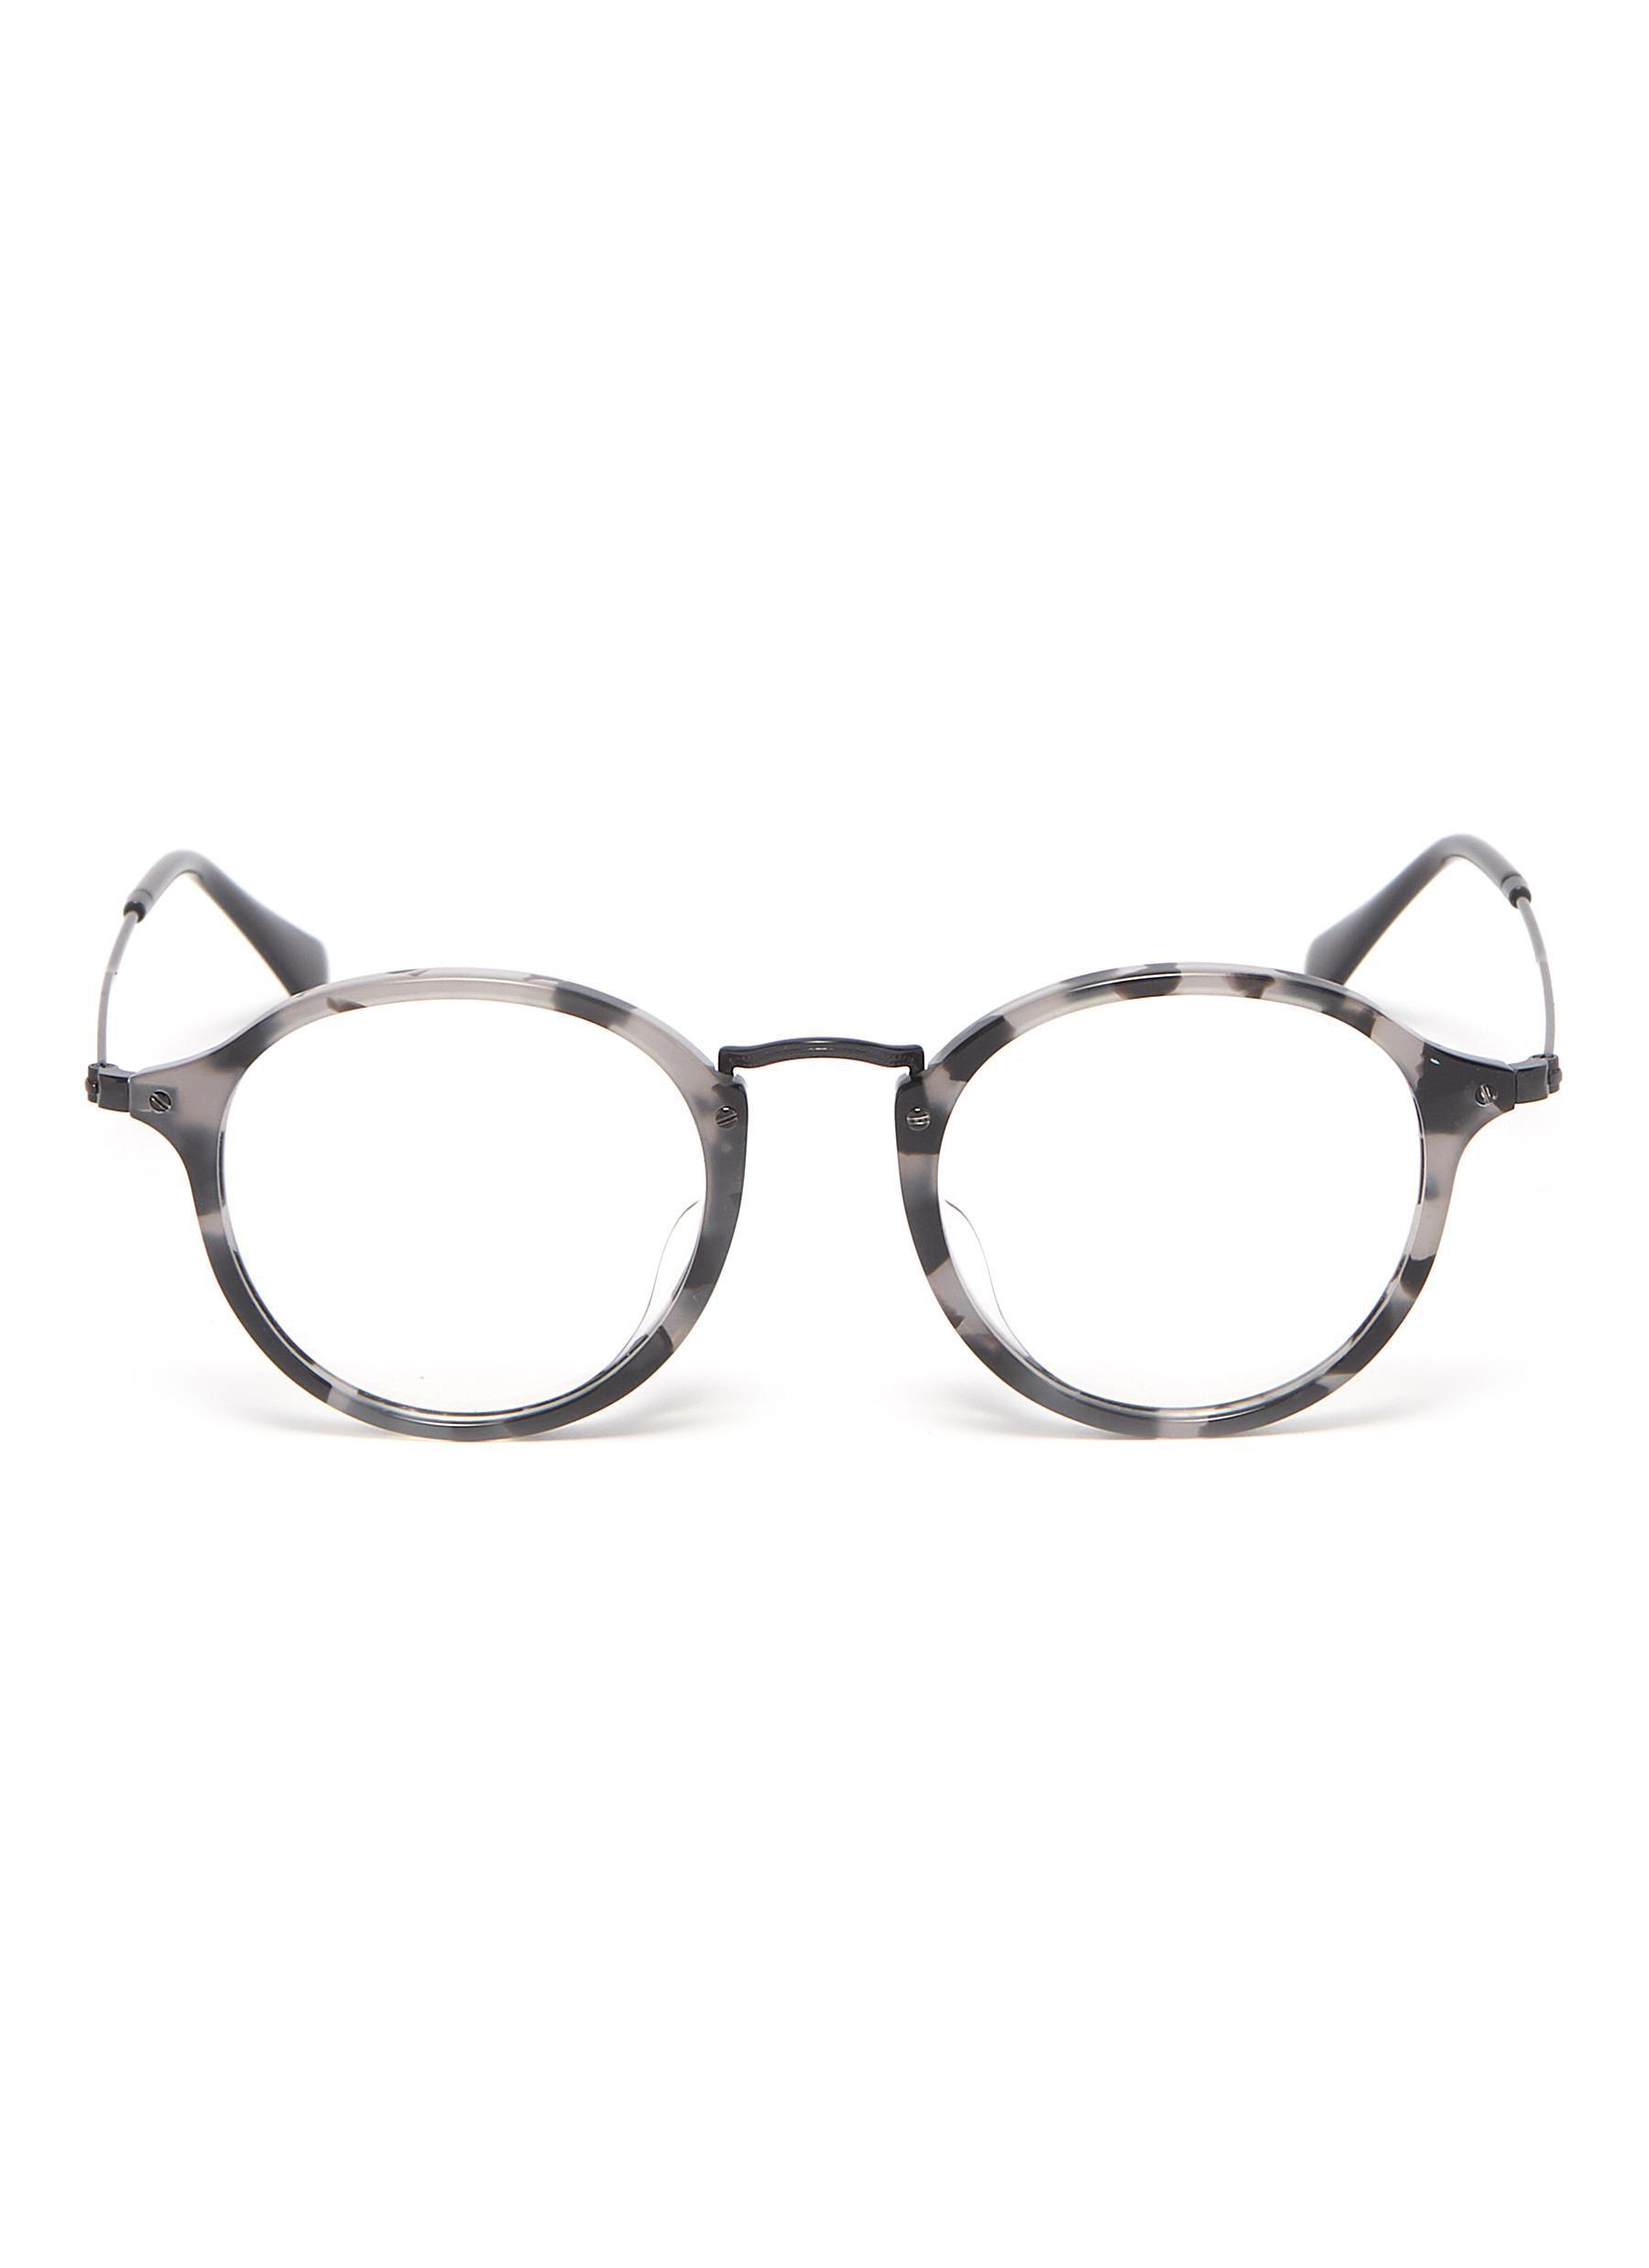 7cf1d36a0 Ray-Ban. Men's 'fleck' Tortoiseshell Acetate Rim Metal Round Optical Glasses